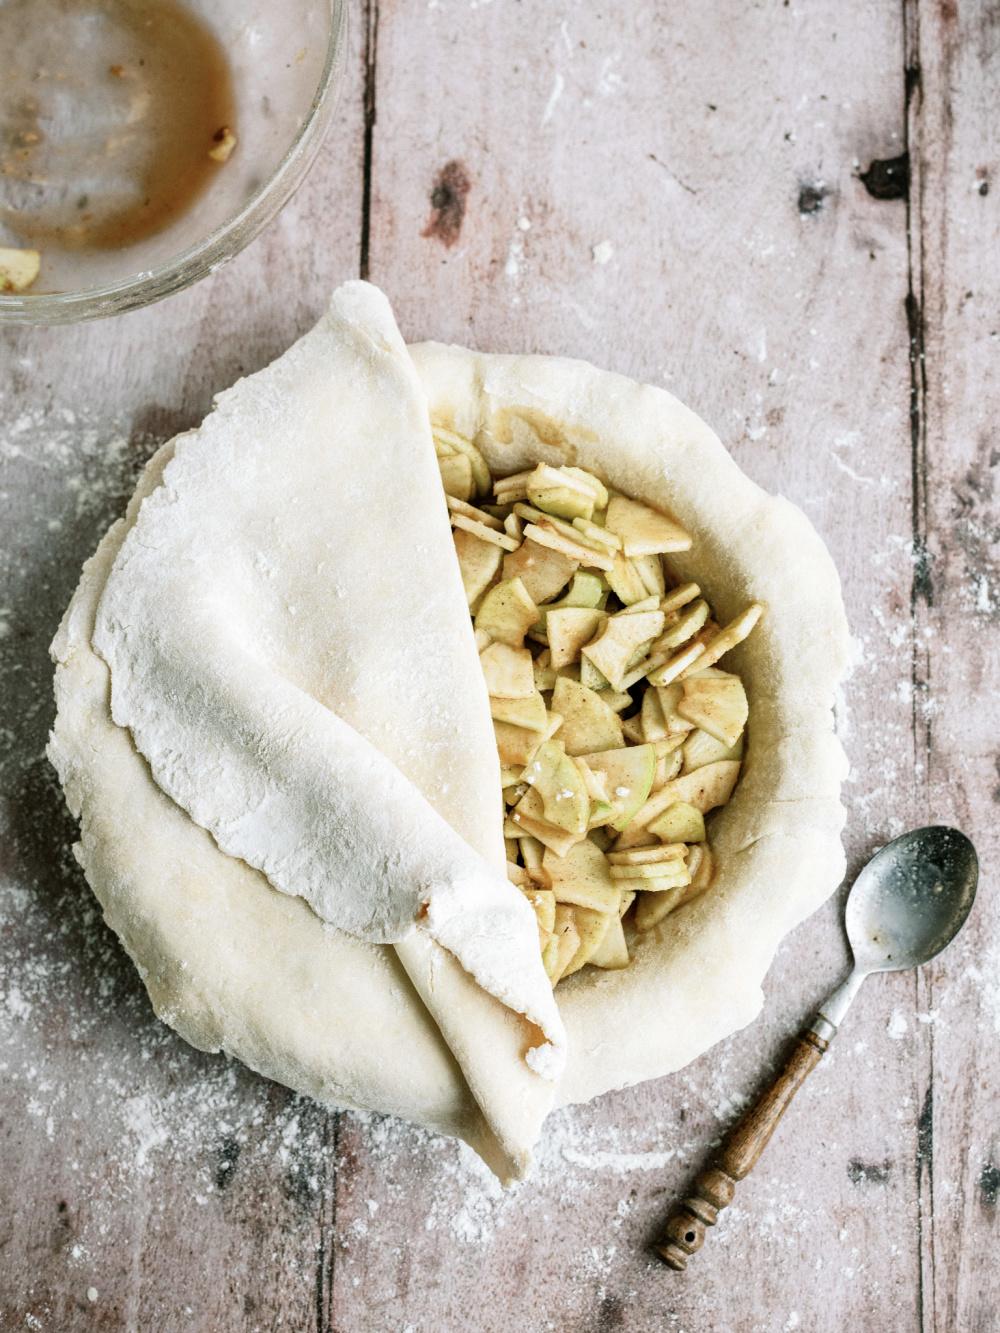 sliced apples inside pie dough to make an apple pie